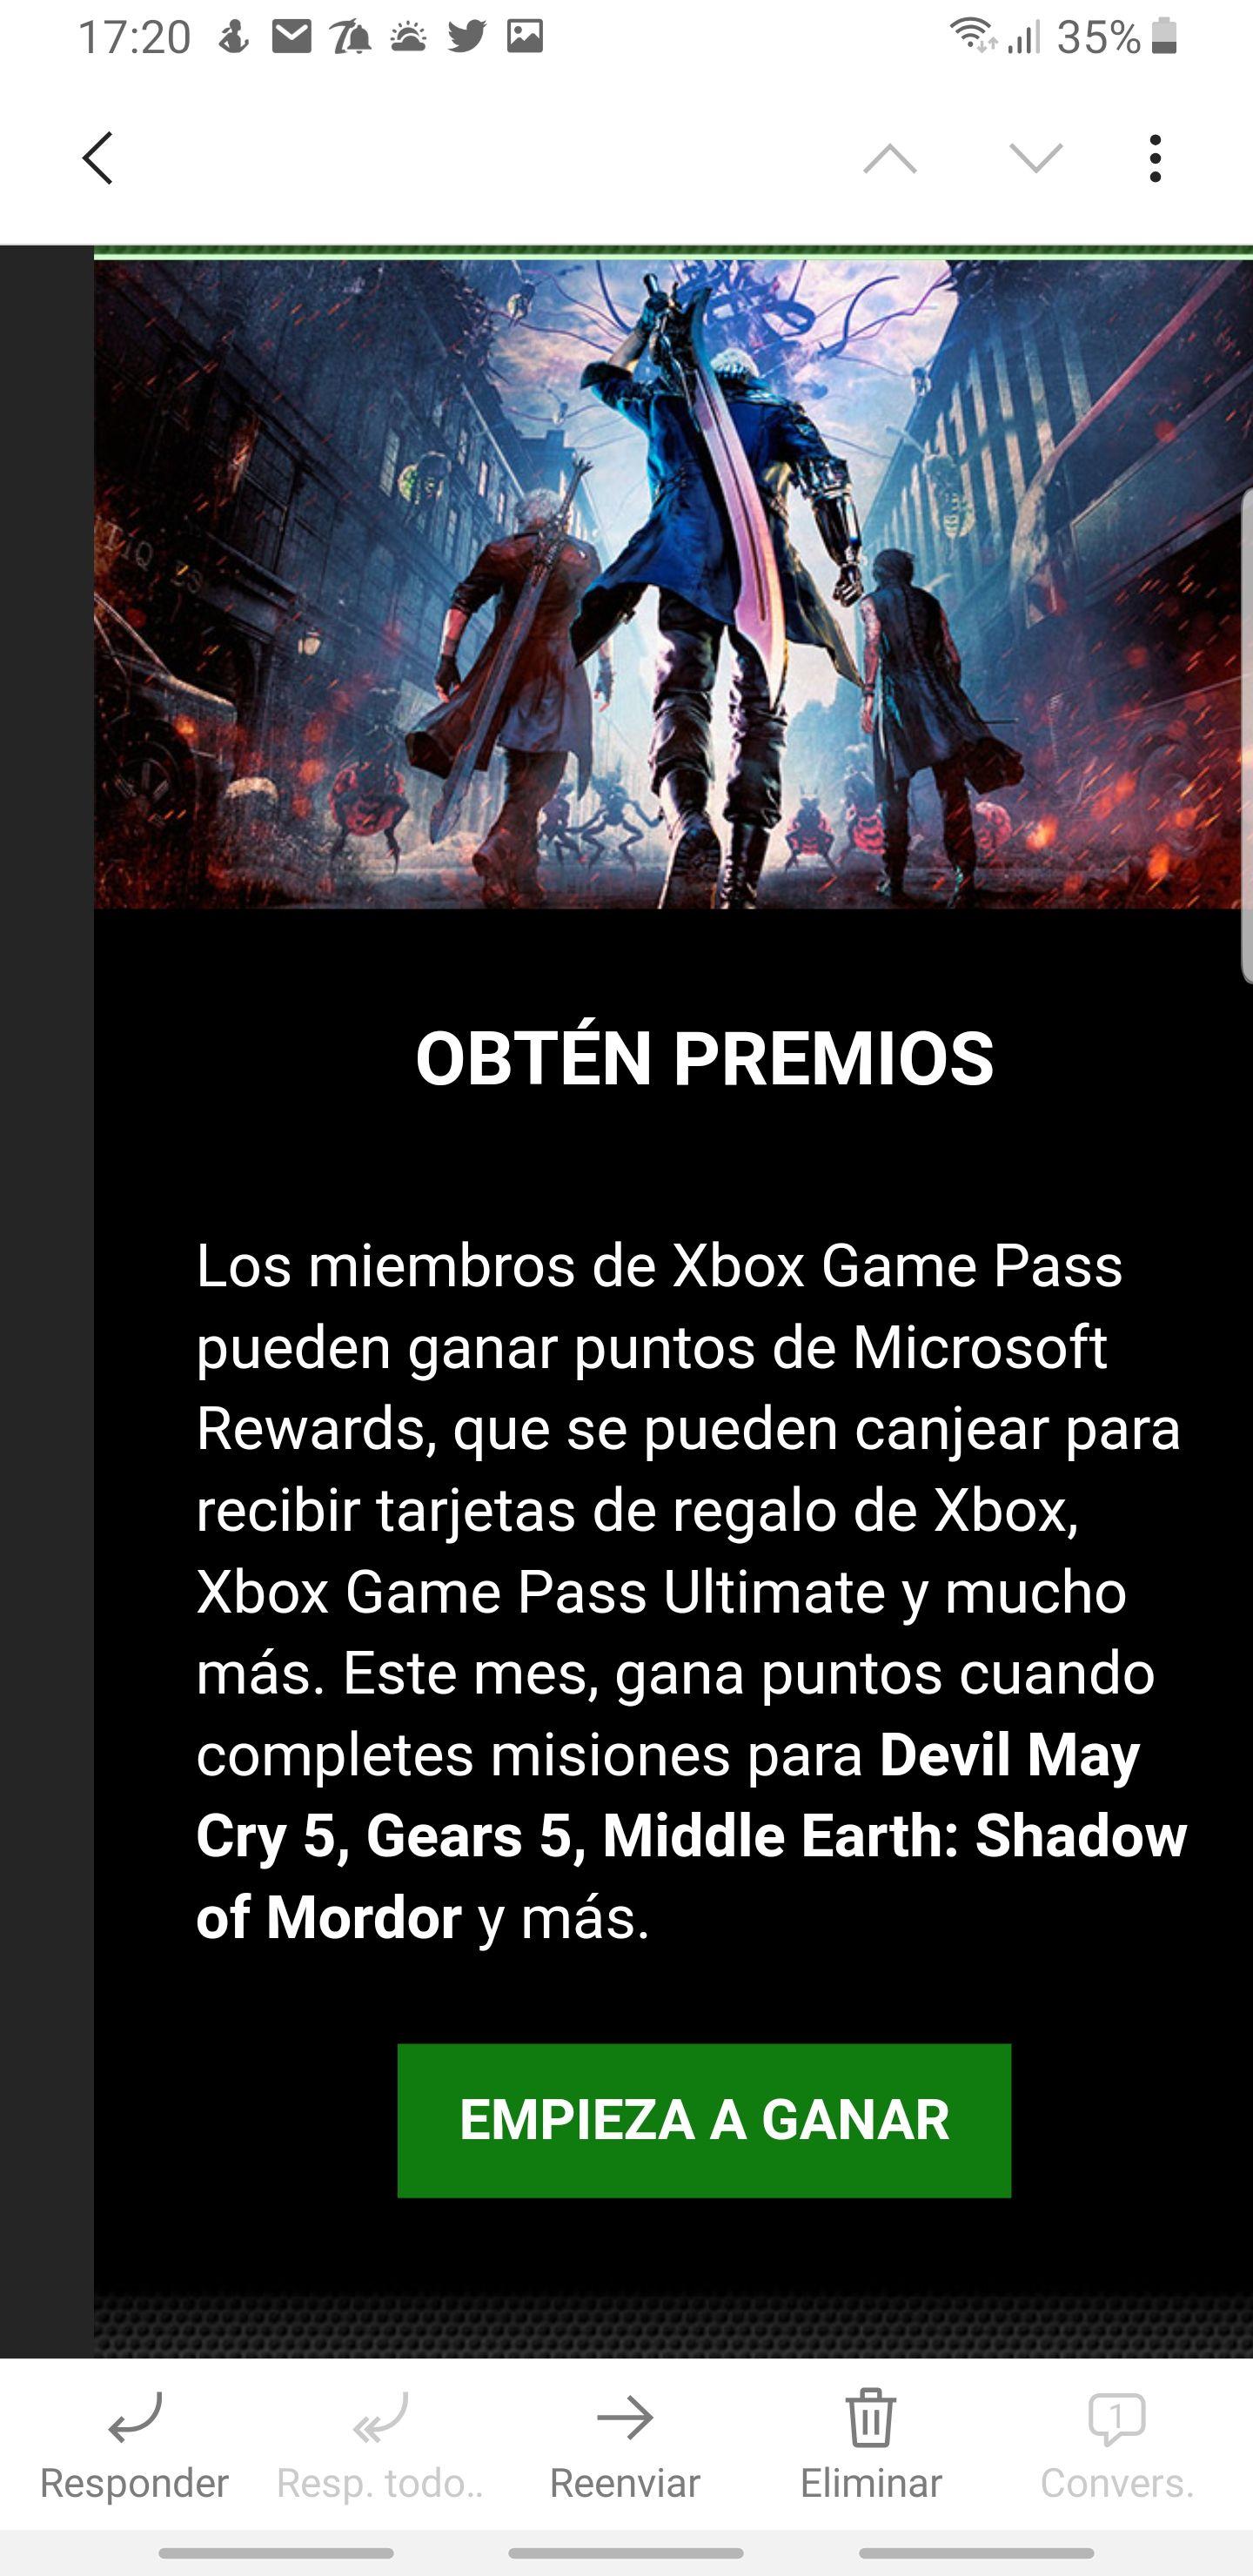 Xbox Game Pass Quests:  Gana saldo xbox jugando a tus juegos favoritos